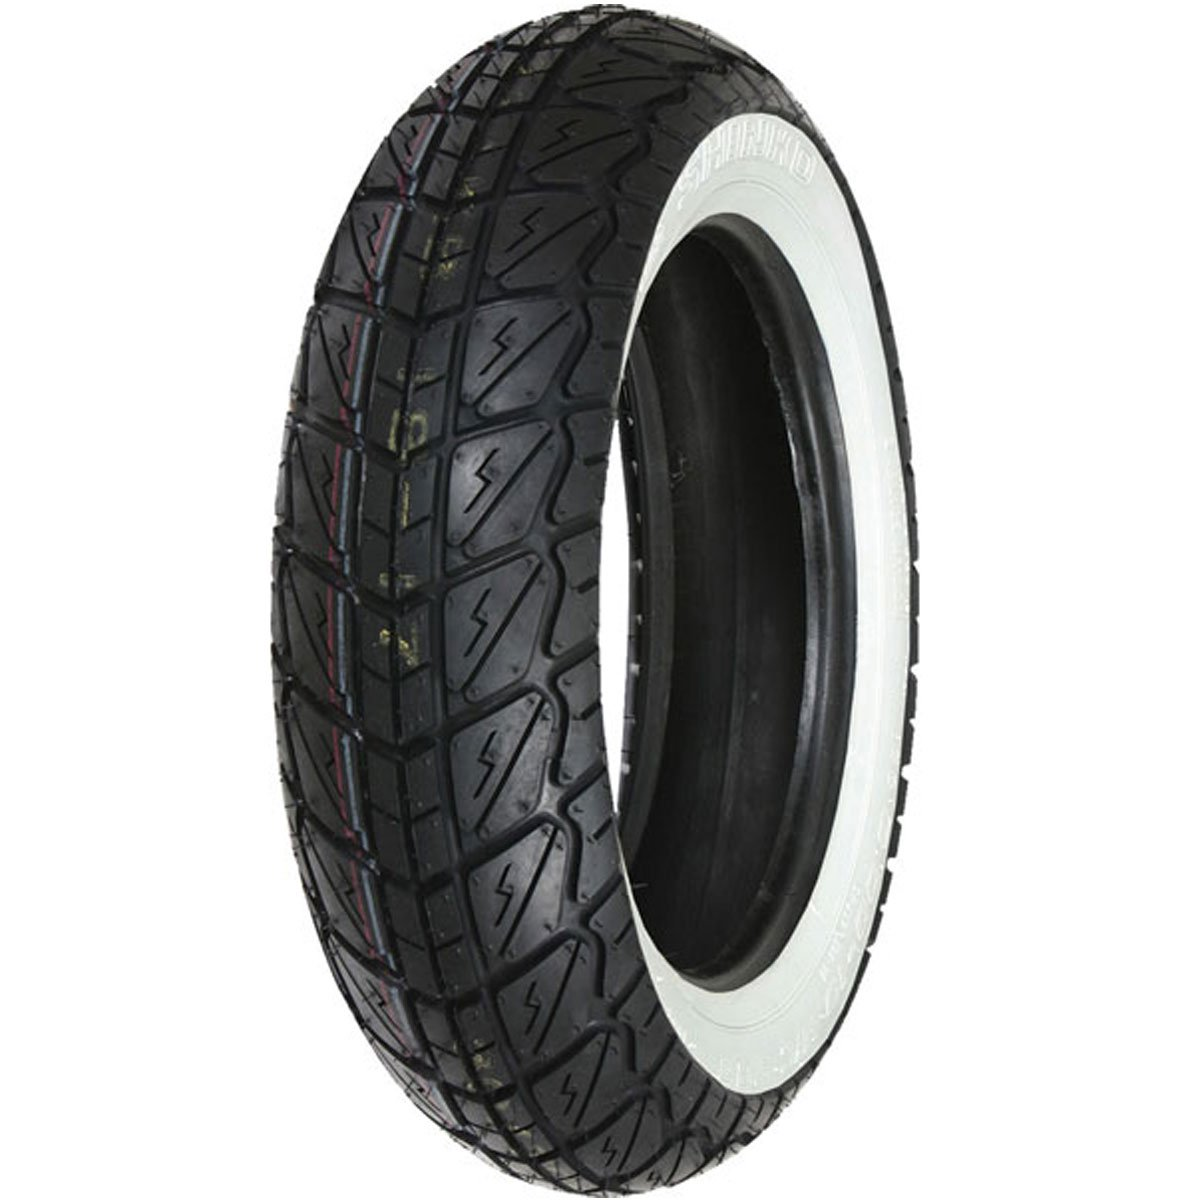 Amazon.com: Shinko SR723 Neumático trasero de pared blanco ...